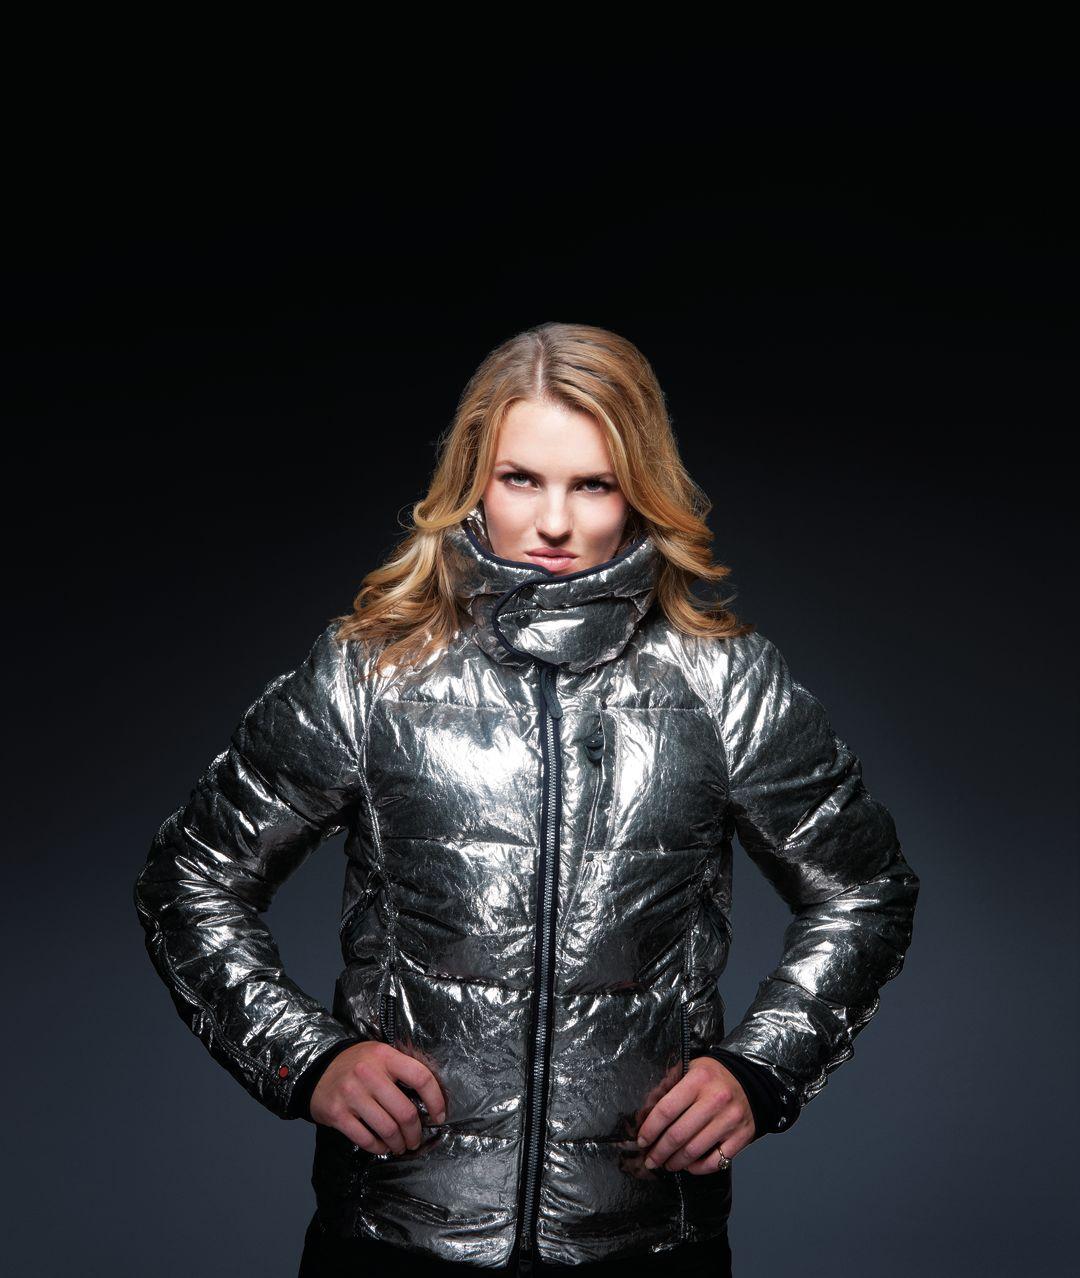 Pcwi 14 fashion abby hughes hlw85d